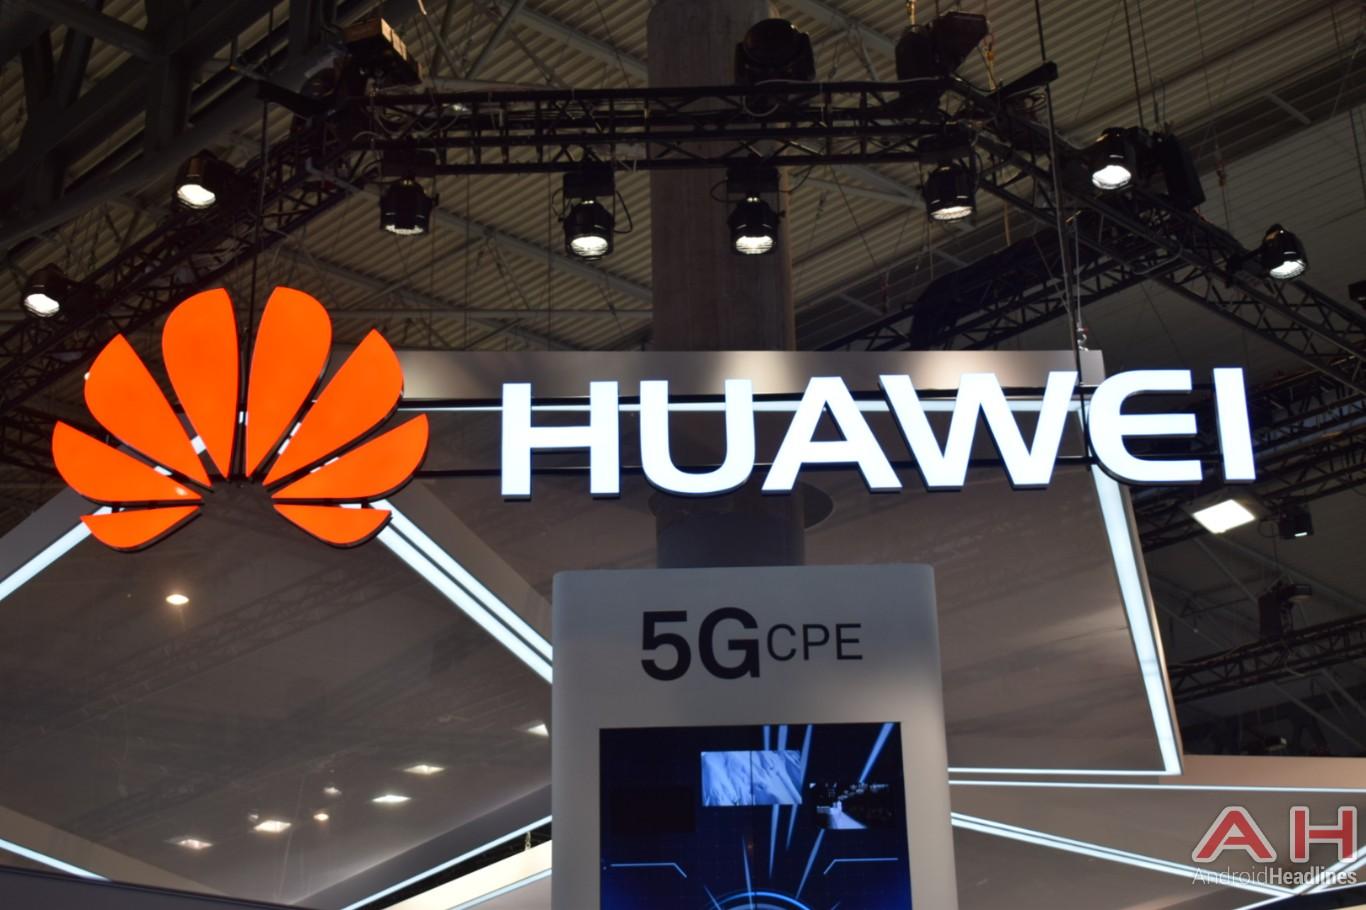 2018MWC上海 | 华为徐直军谈5G芯片和商用时间表